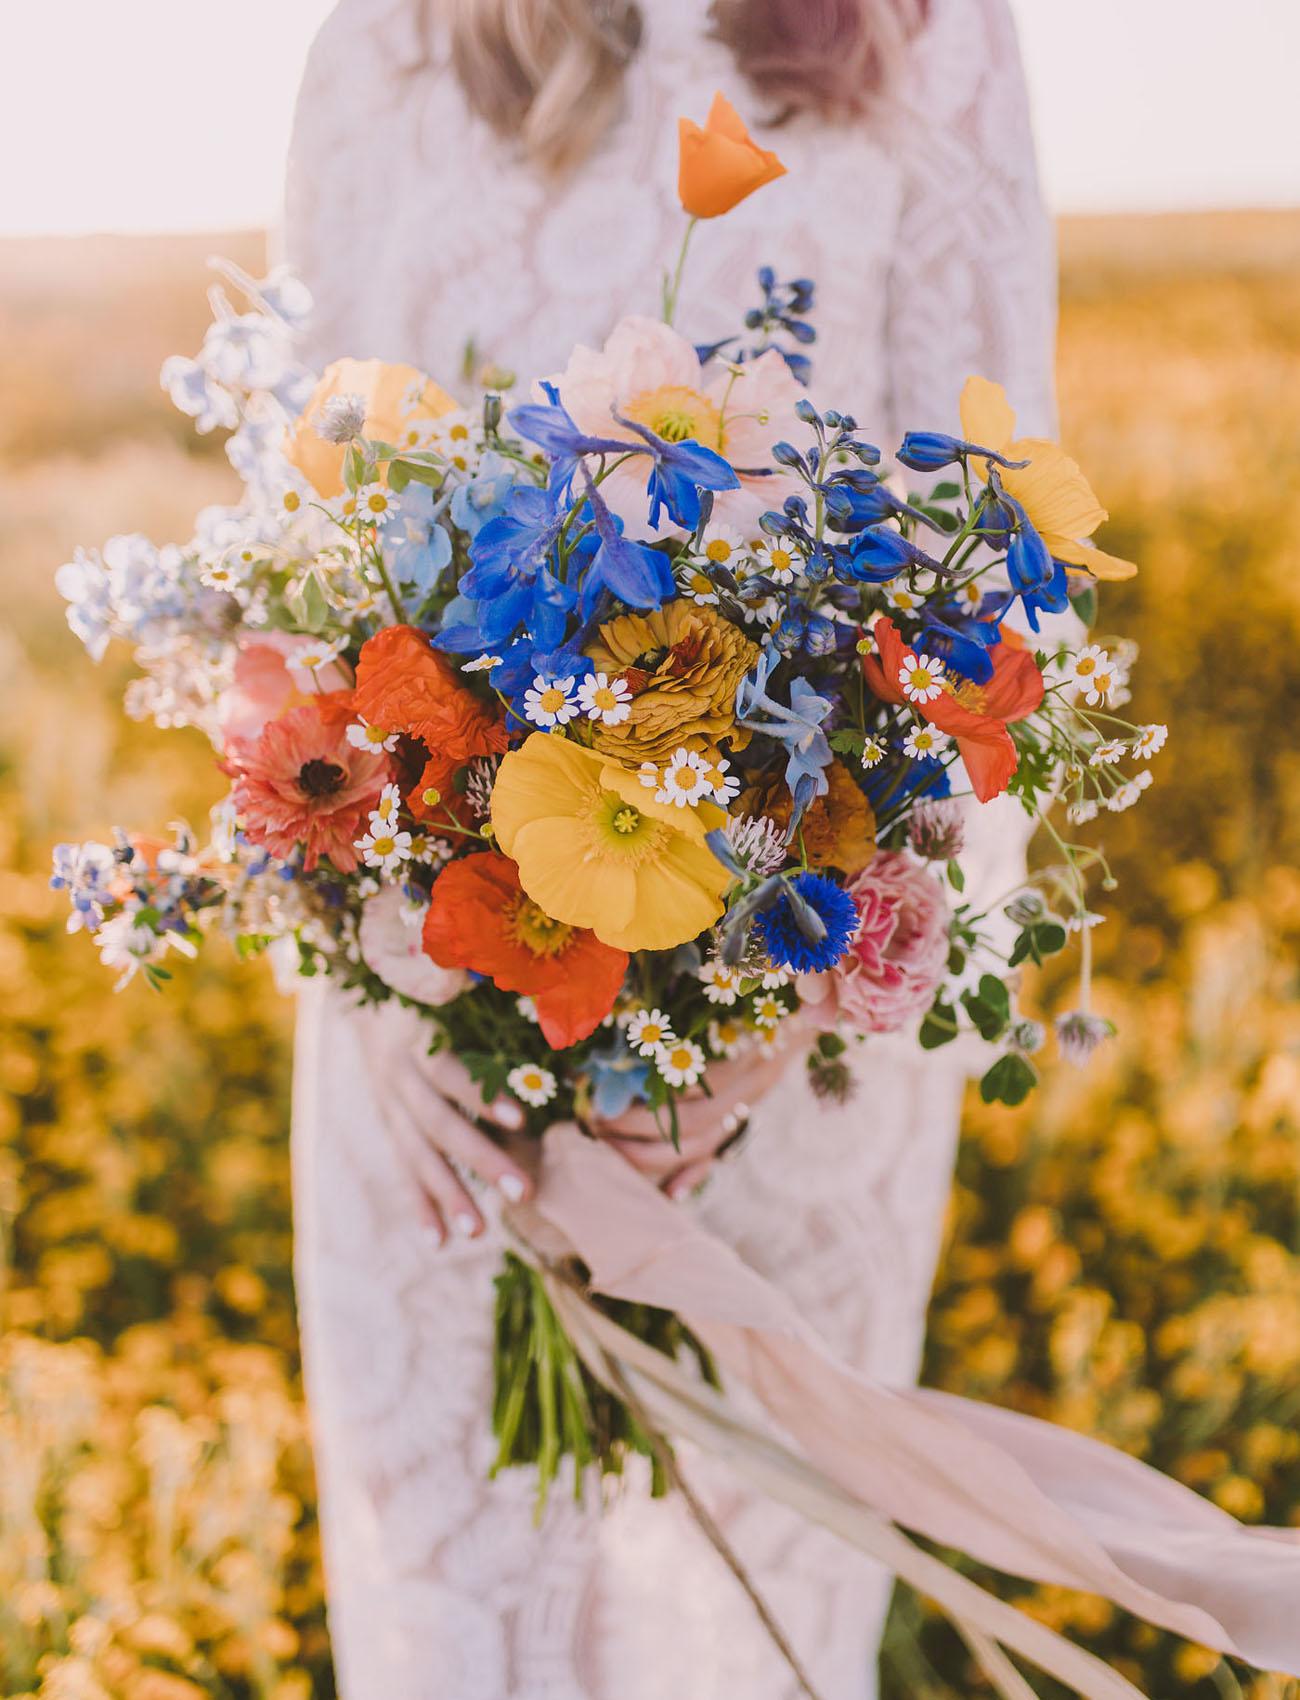 Veldboeket met gekleurde bloemen